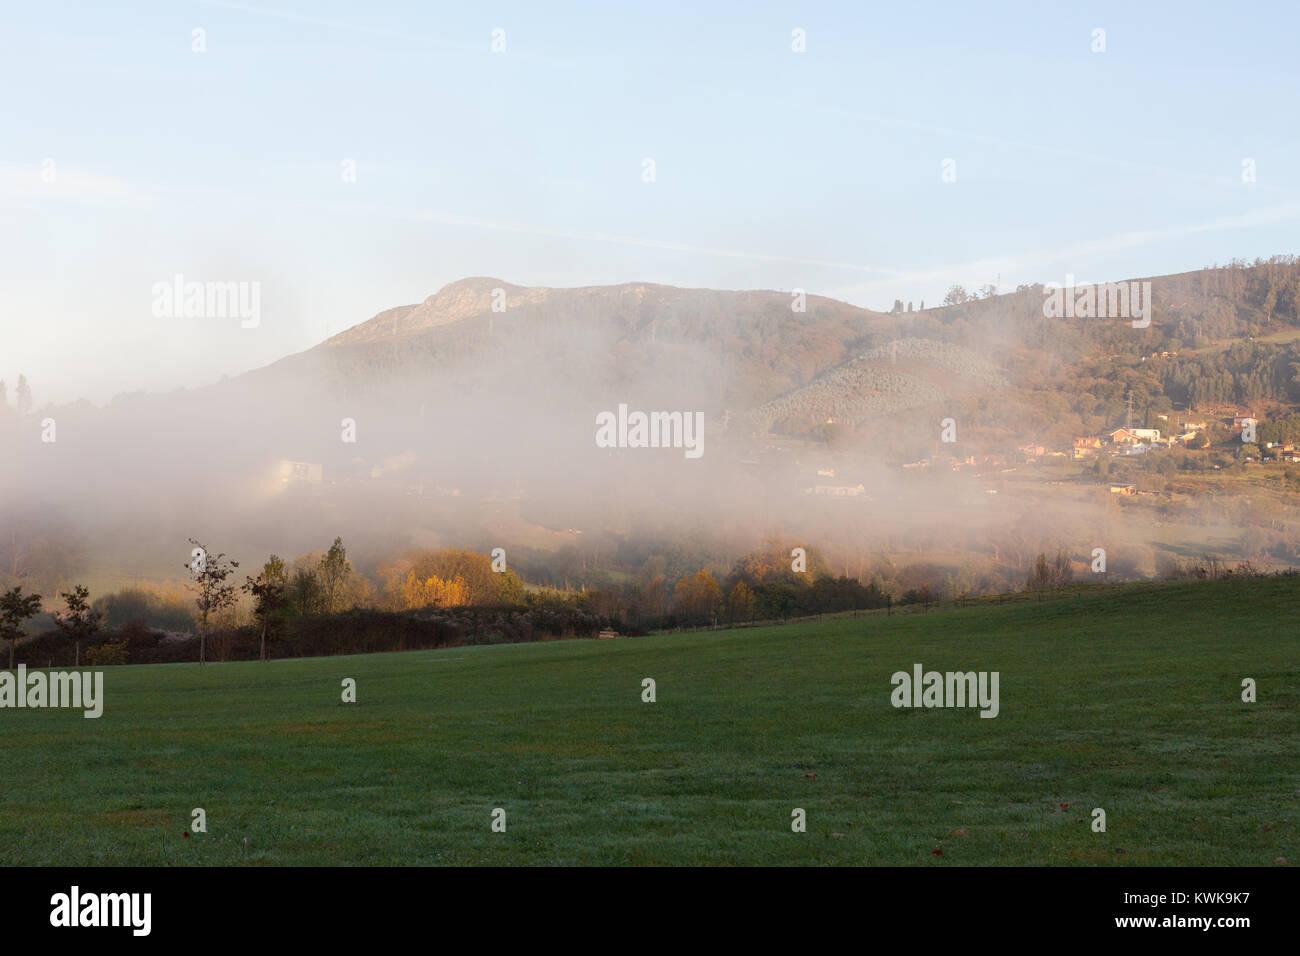 Morning fog in the Park of the Way of Saint James (Parque del Camino de Santiago) in Oviedo, Asturias, Spain - Stock Image